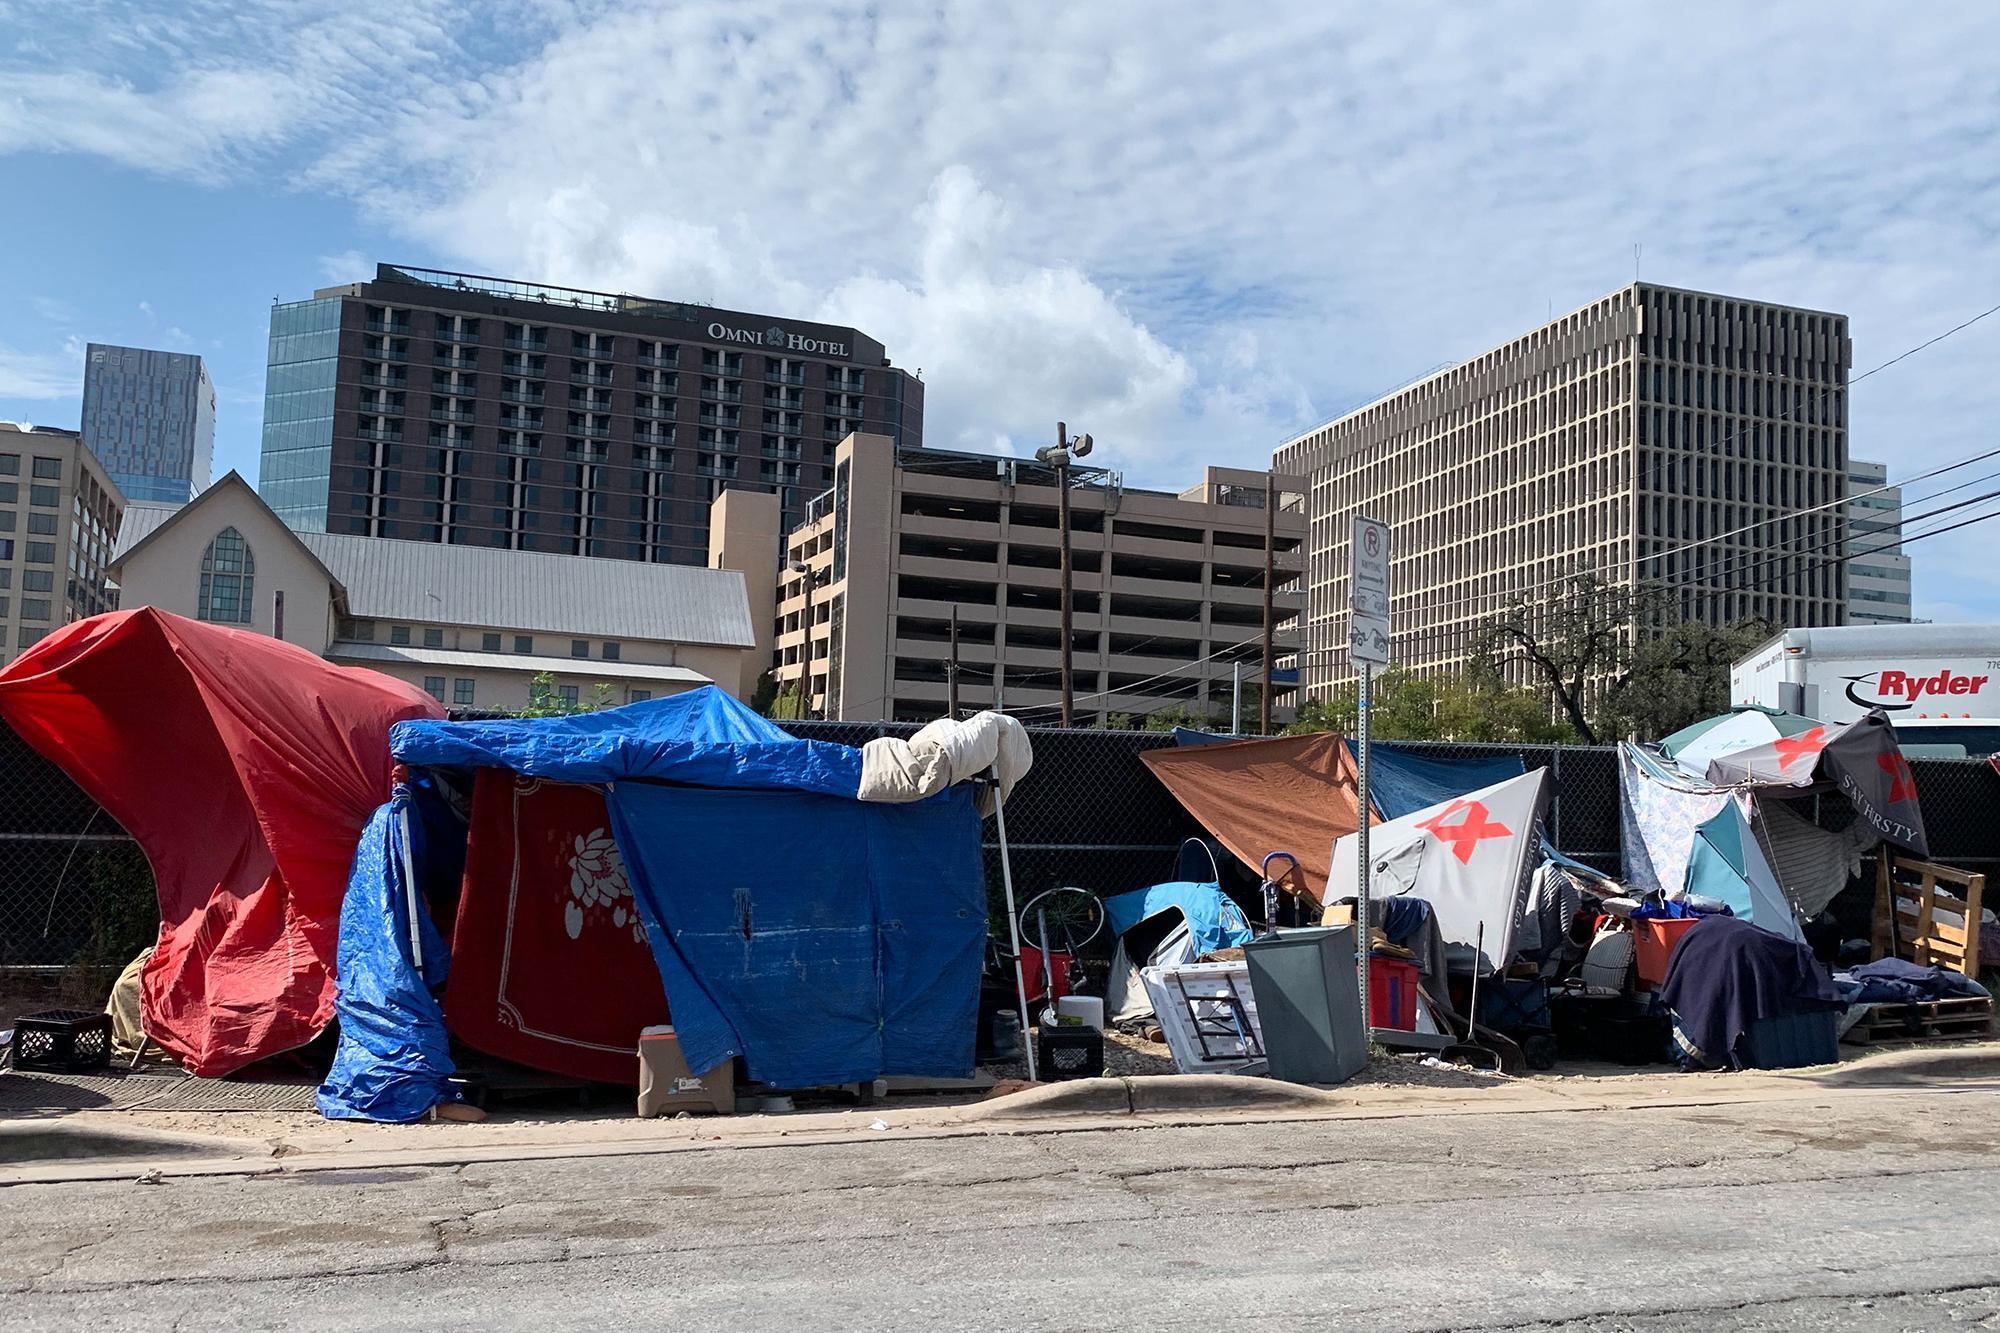 A homeless camp in Austin, Texas